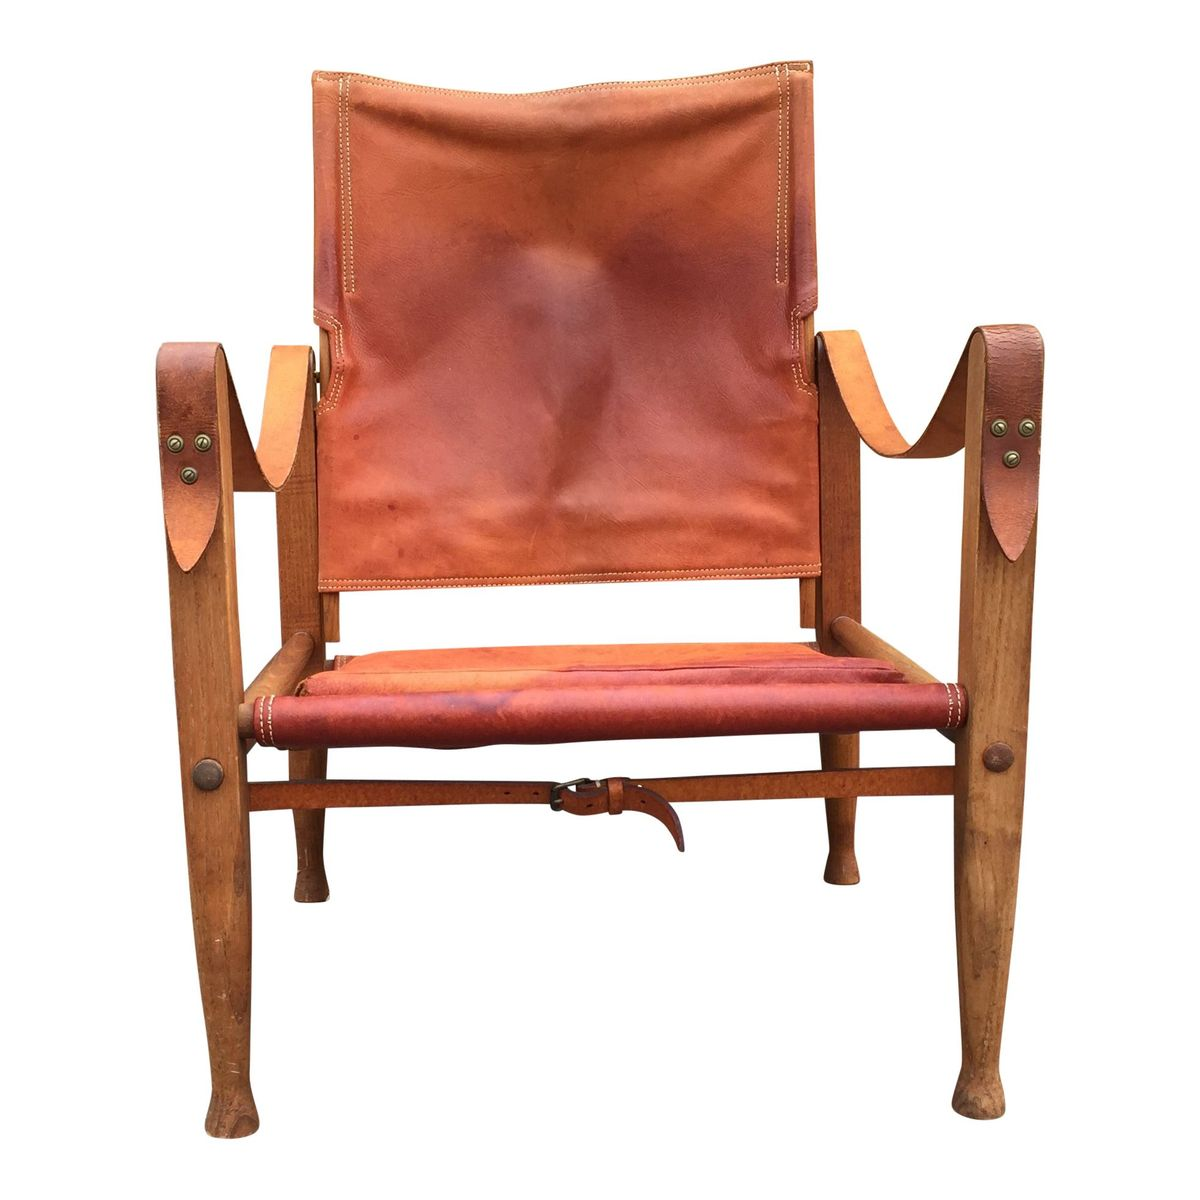 leather safari chair plastic resin adirondack chairs by kaare klint for rud rasmussen